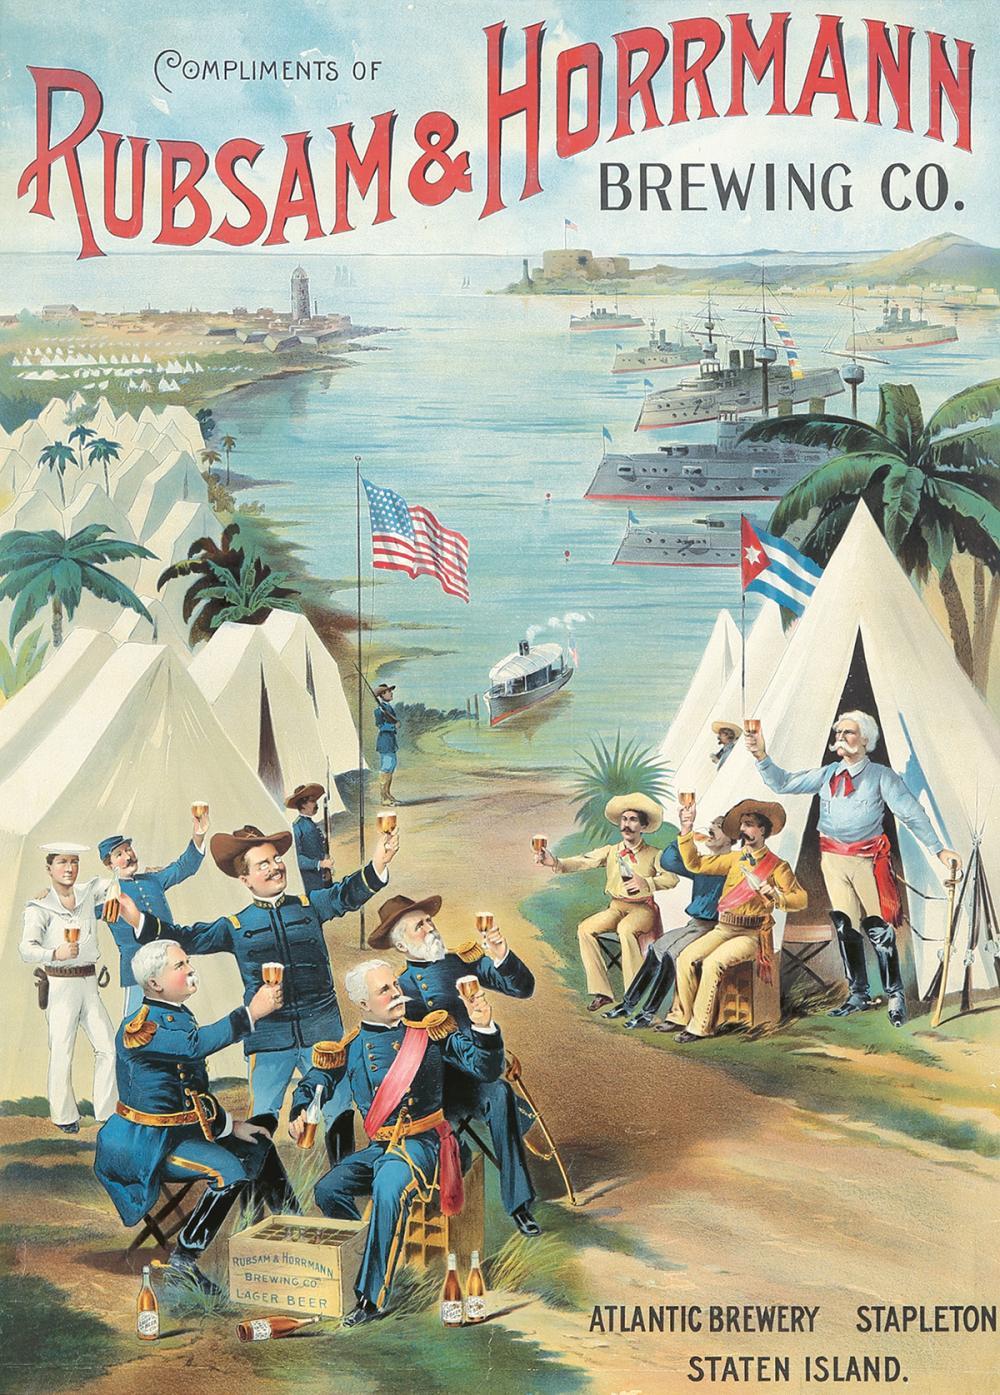 Rubsam & Horrmann Brewing Co. ca. 1900.